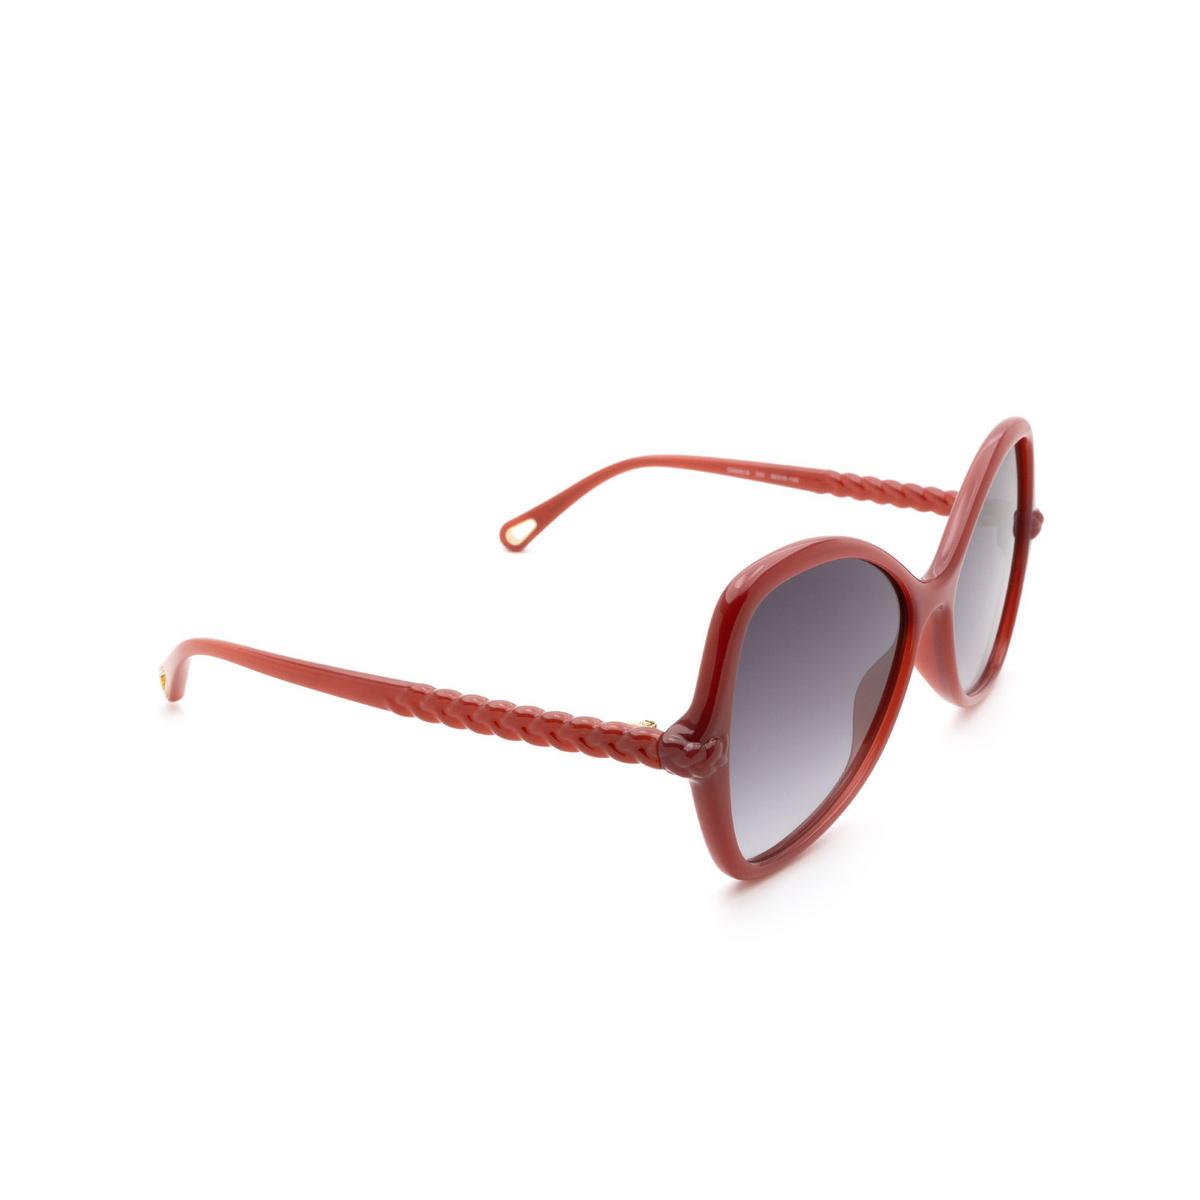 Chloé® Butterfly Sunglasses: CH0001S color Orange 004 - three-quarters view.